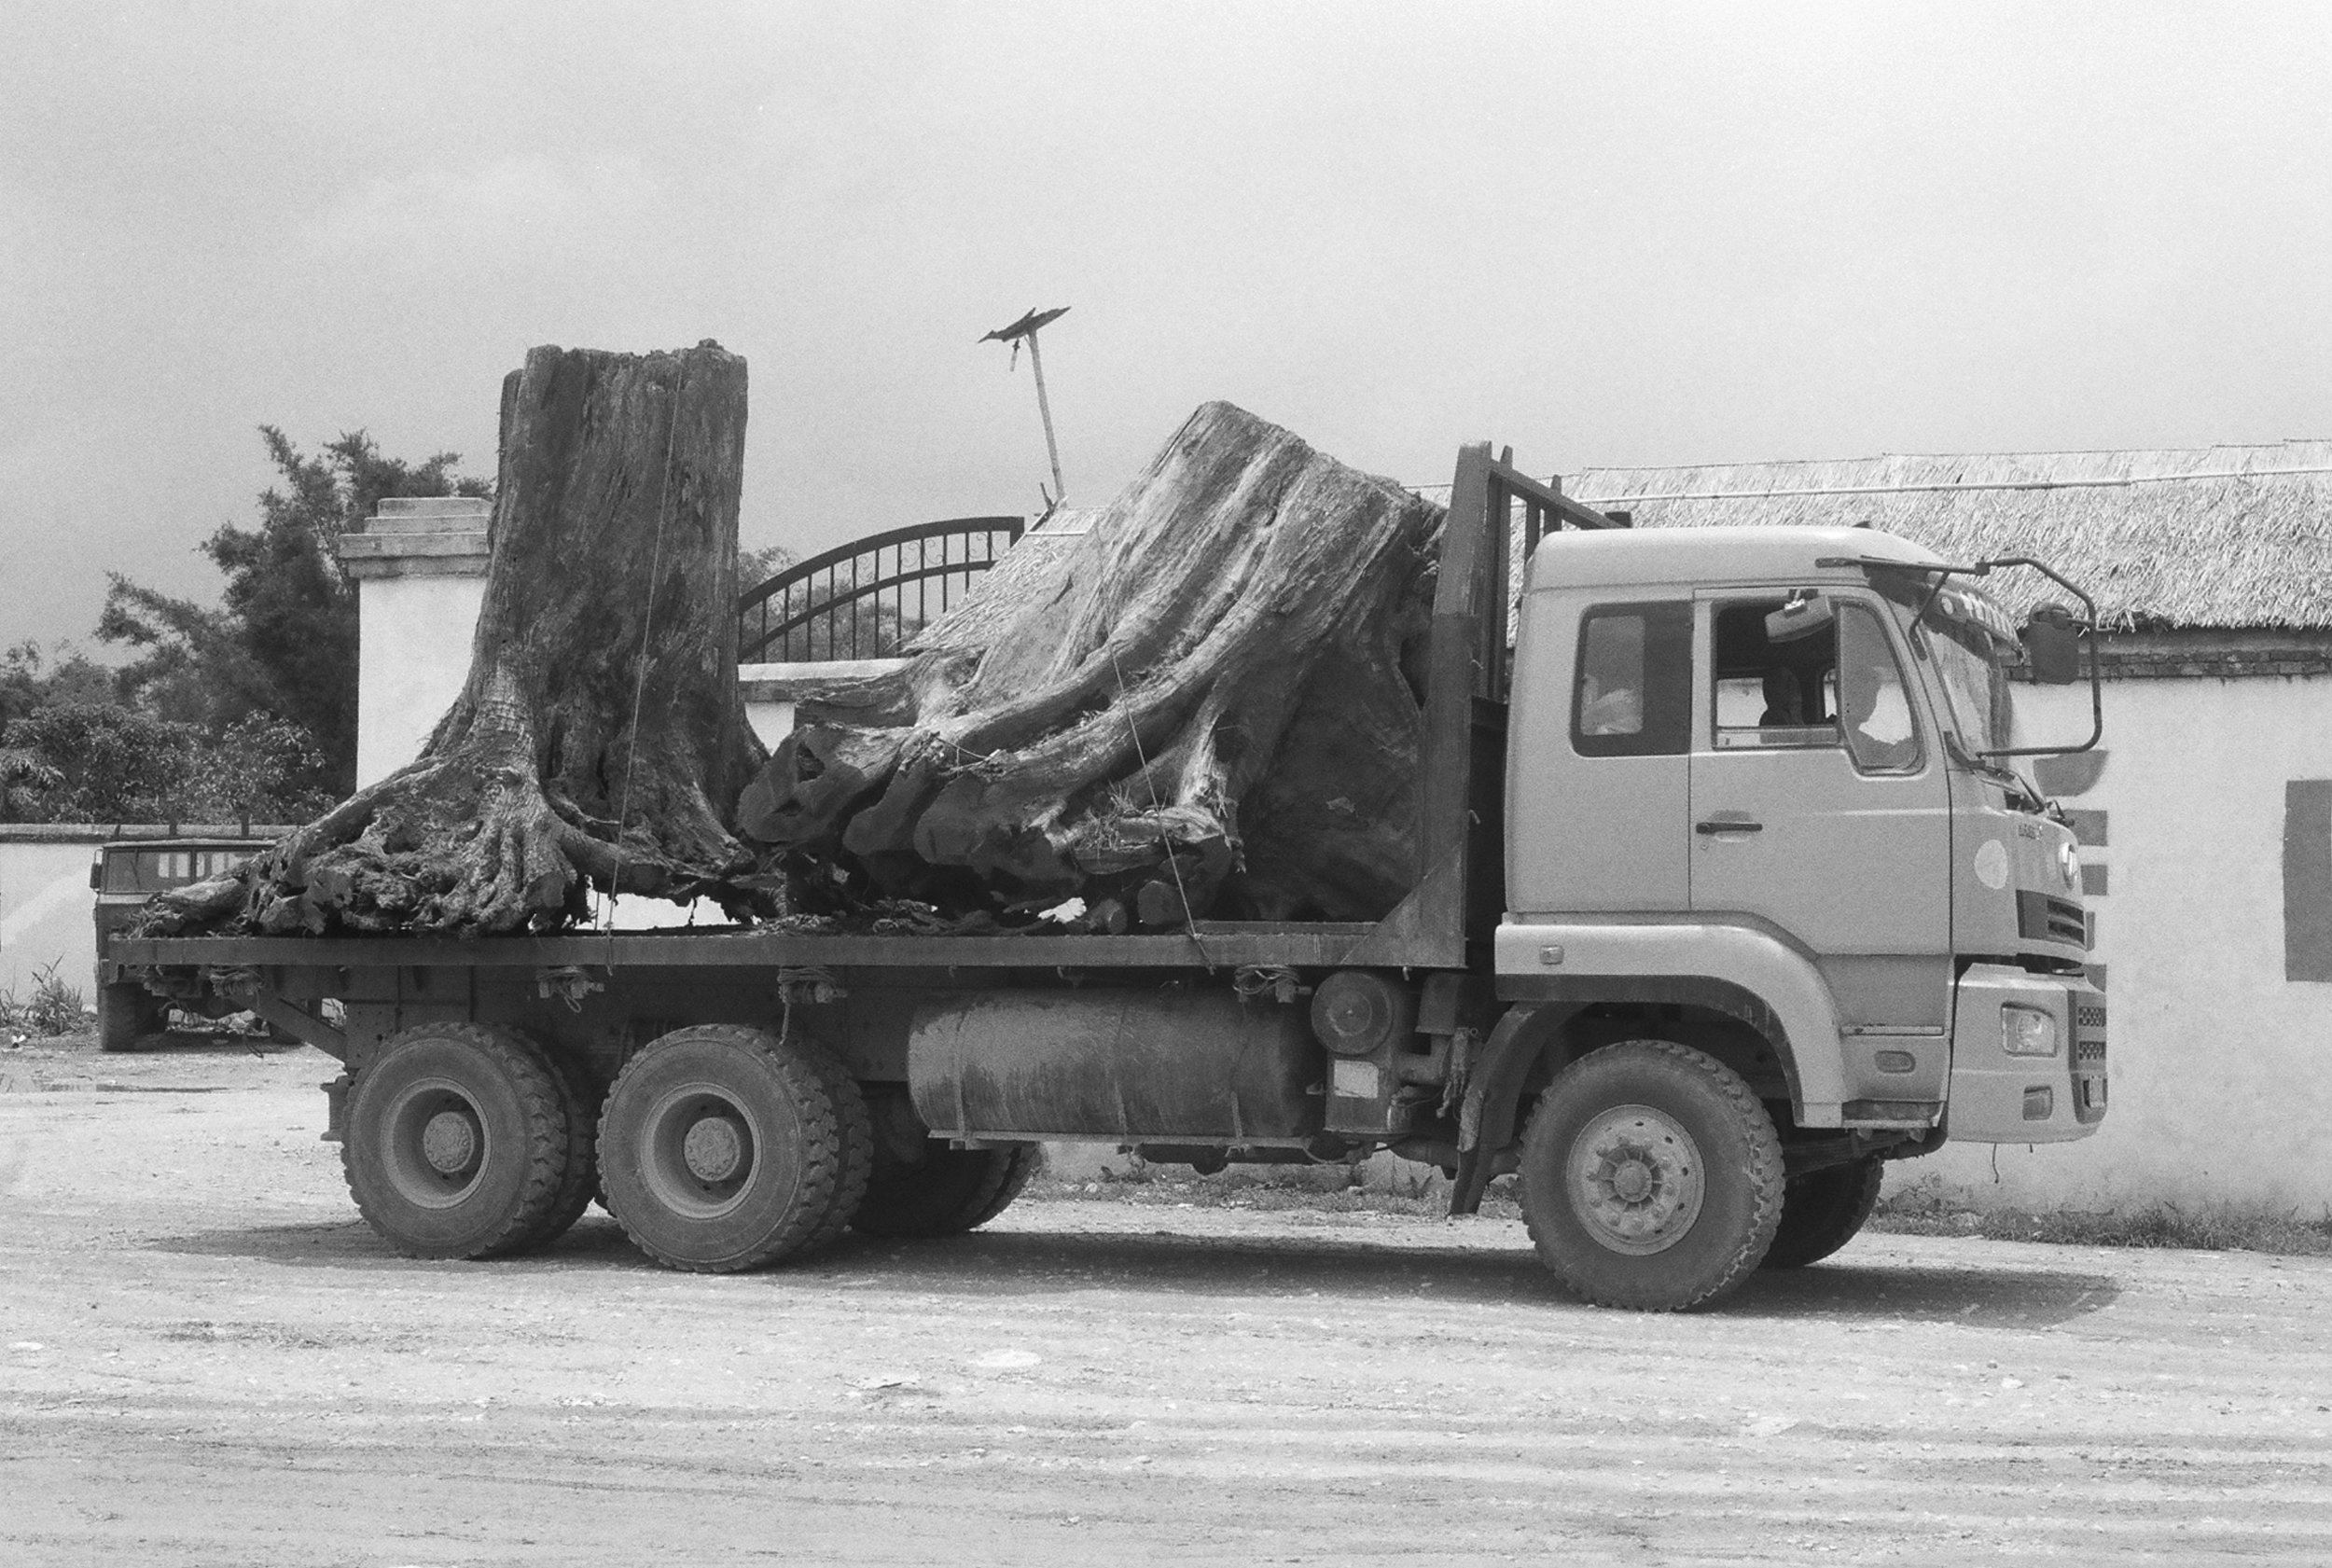 Chinese logging truck with Burmese trees on the China-Myamar border near Nongdao, Yunnan, China.